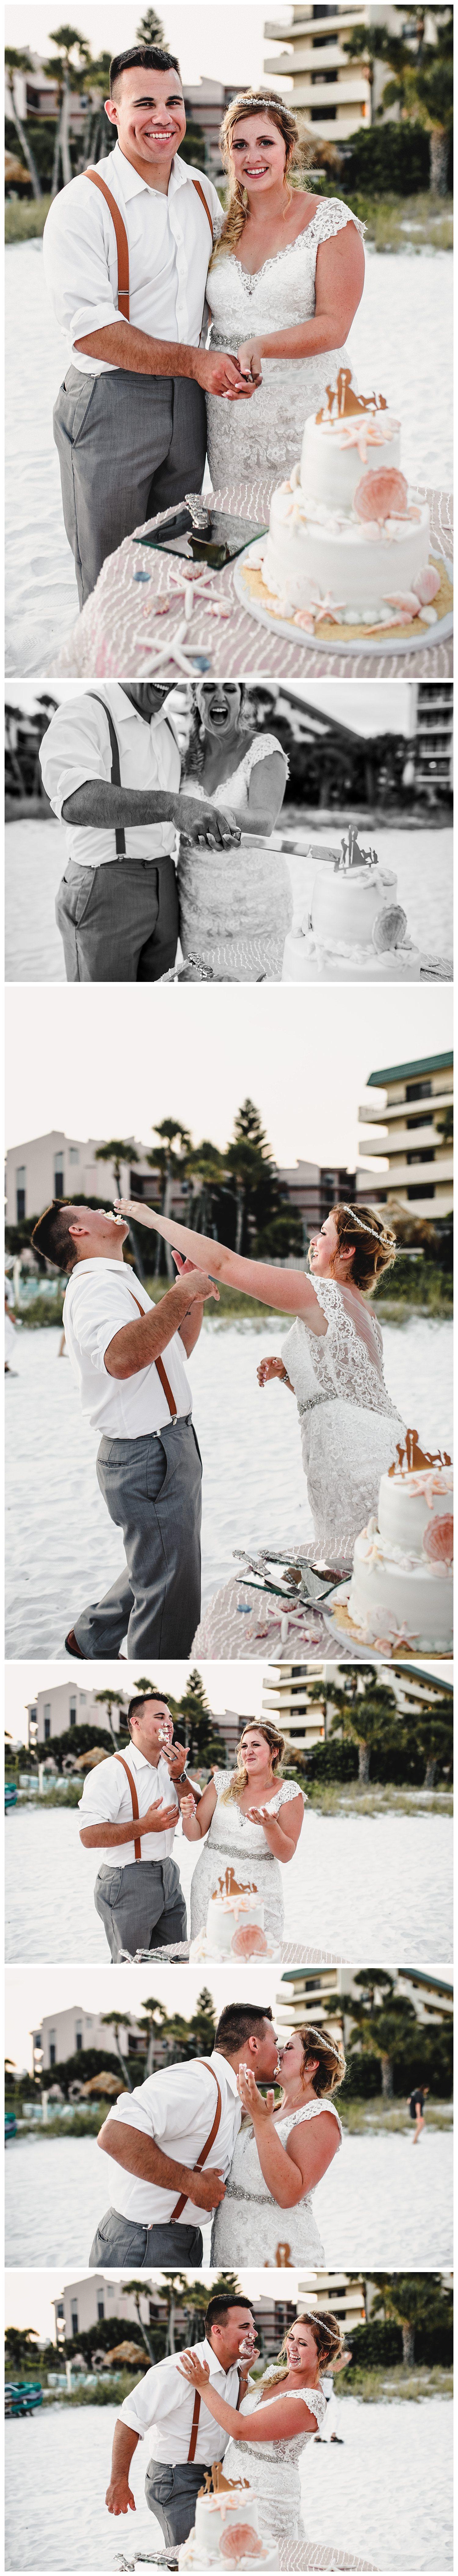 Kelsey_Diane_Photography_Destination_Wedding_Sarasota_Florida_Beach_Wedding_Alex_Austin_0683.jpg